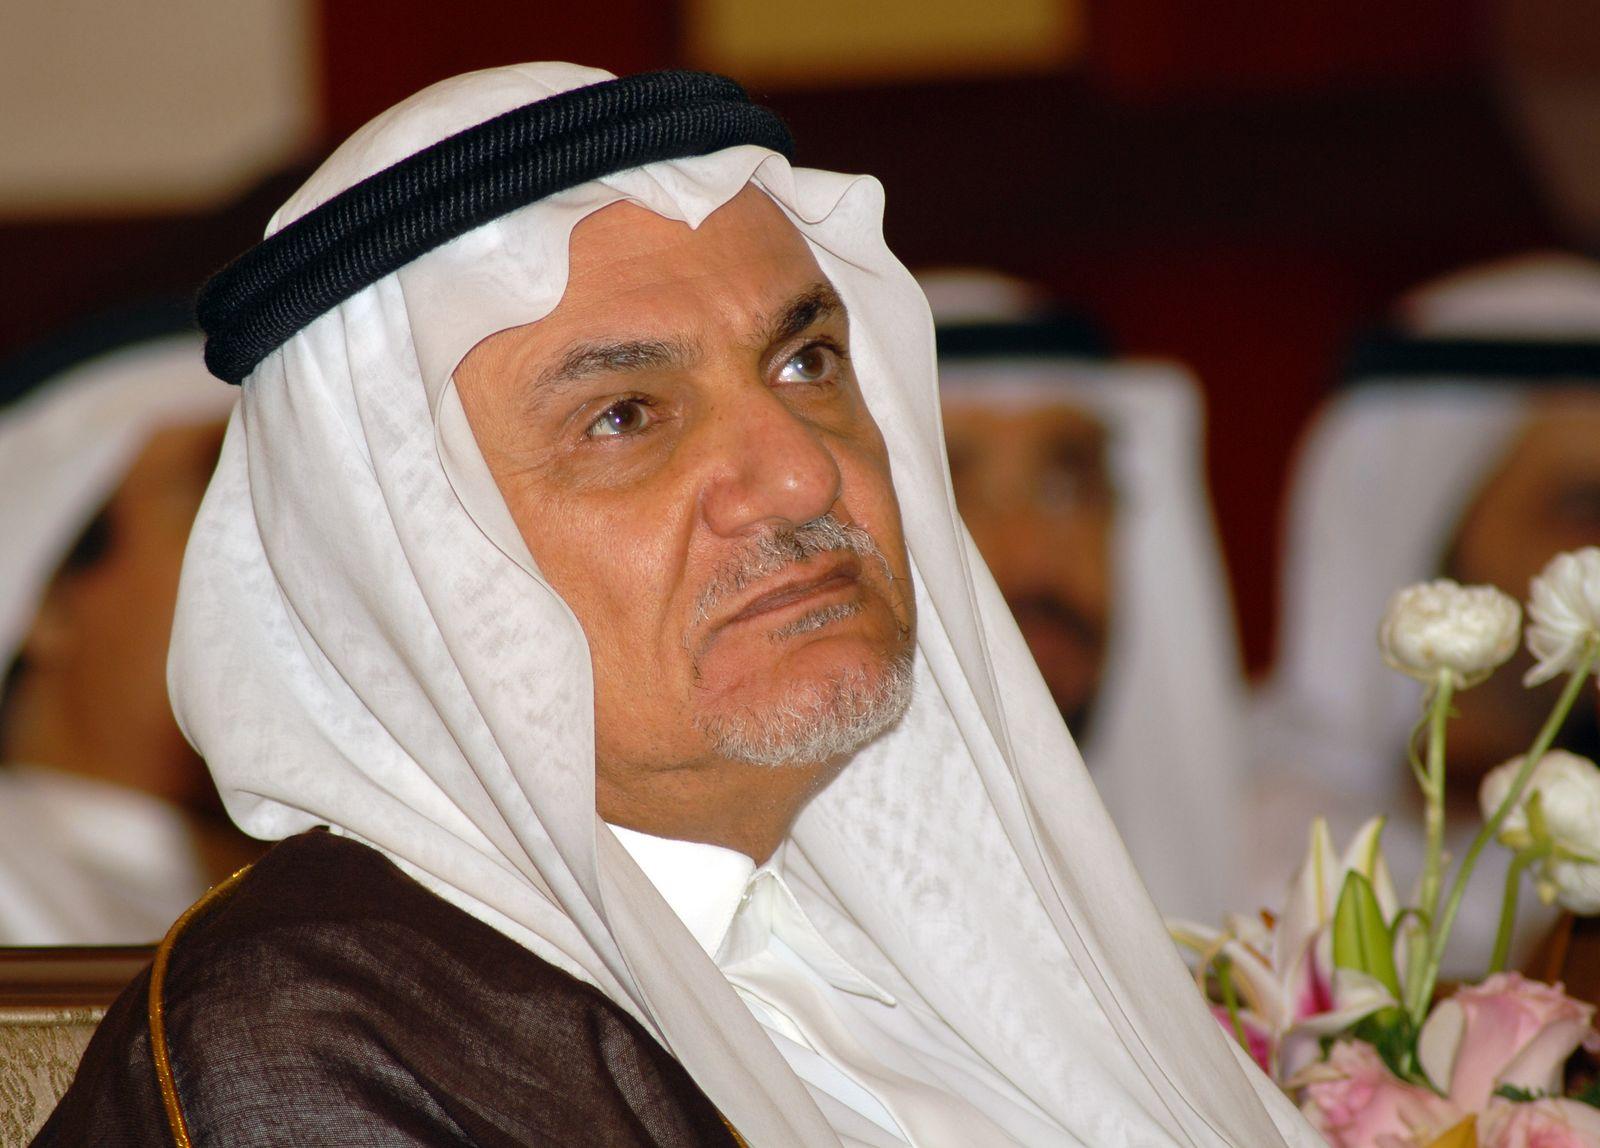 Prinz Turki Al Faisal Bin Abdulaziz Al Saud